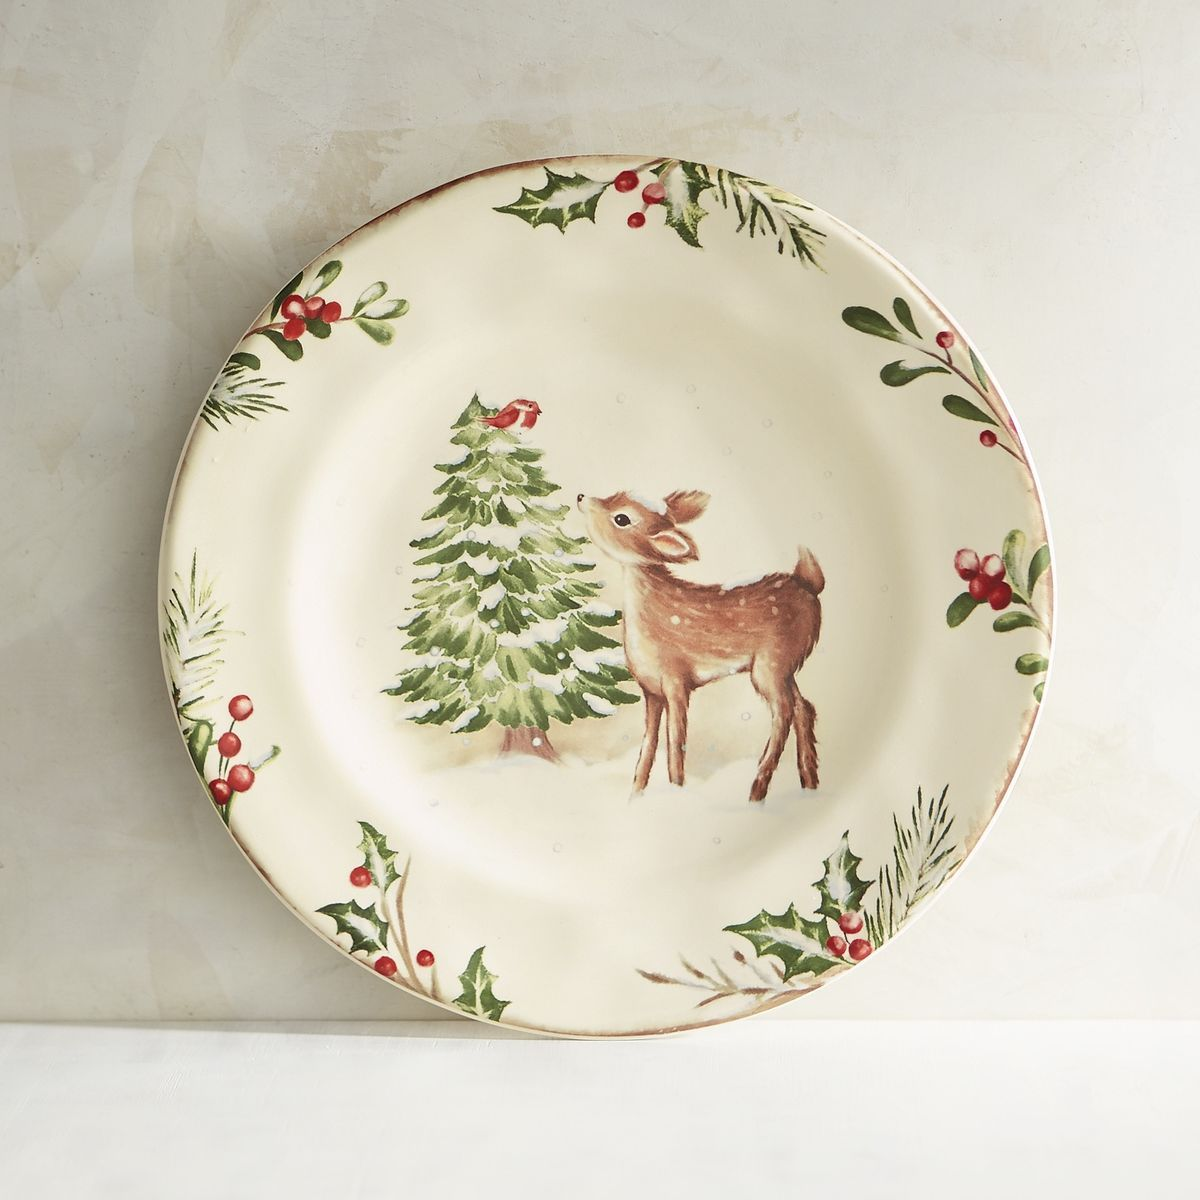 Winter\u0027s Wonder Deer Salad Plate | Pier 1 Imports & Winter\u0027s Wonder Deer Salad Plate | Pier 1 Imports | Happy Holidays ...